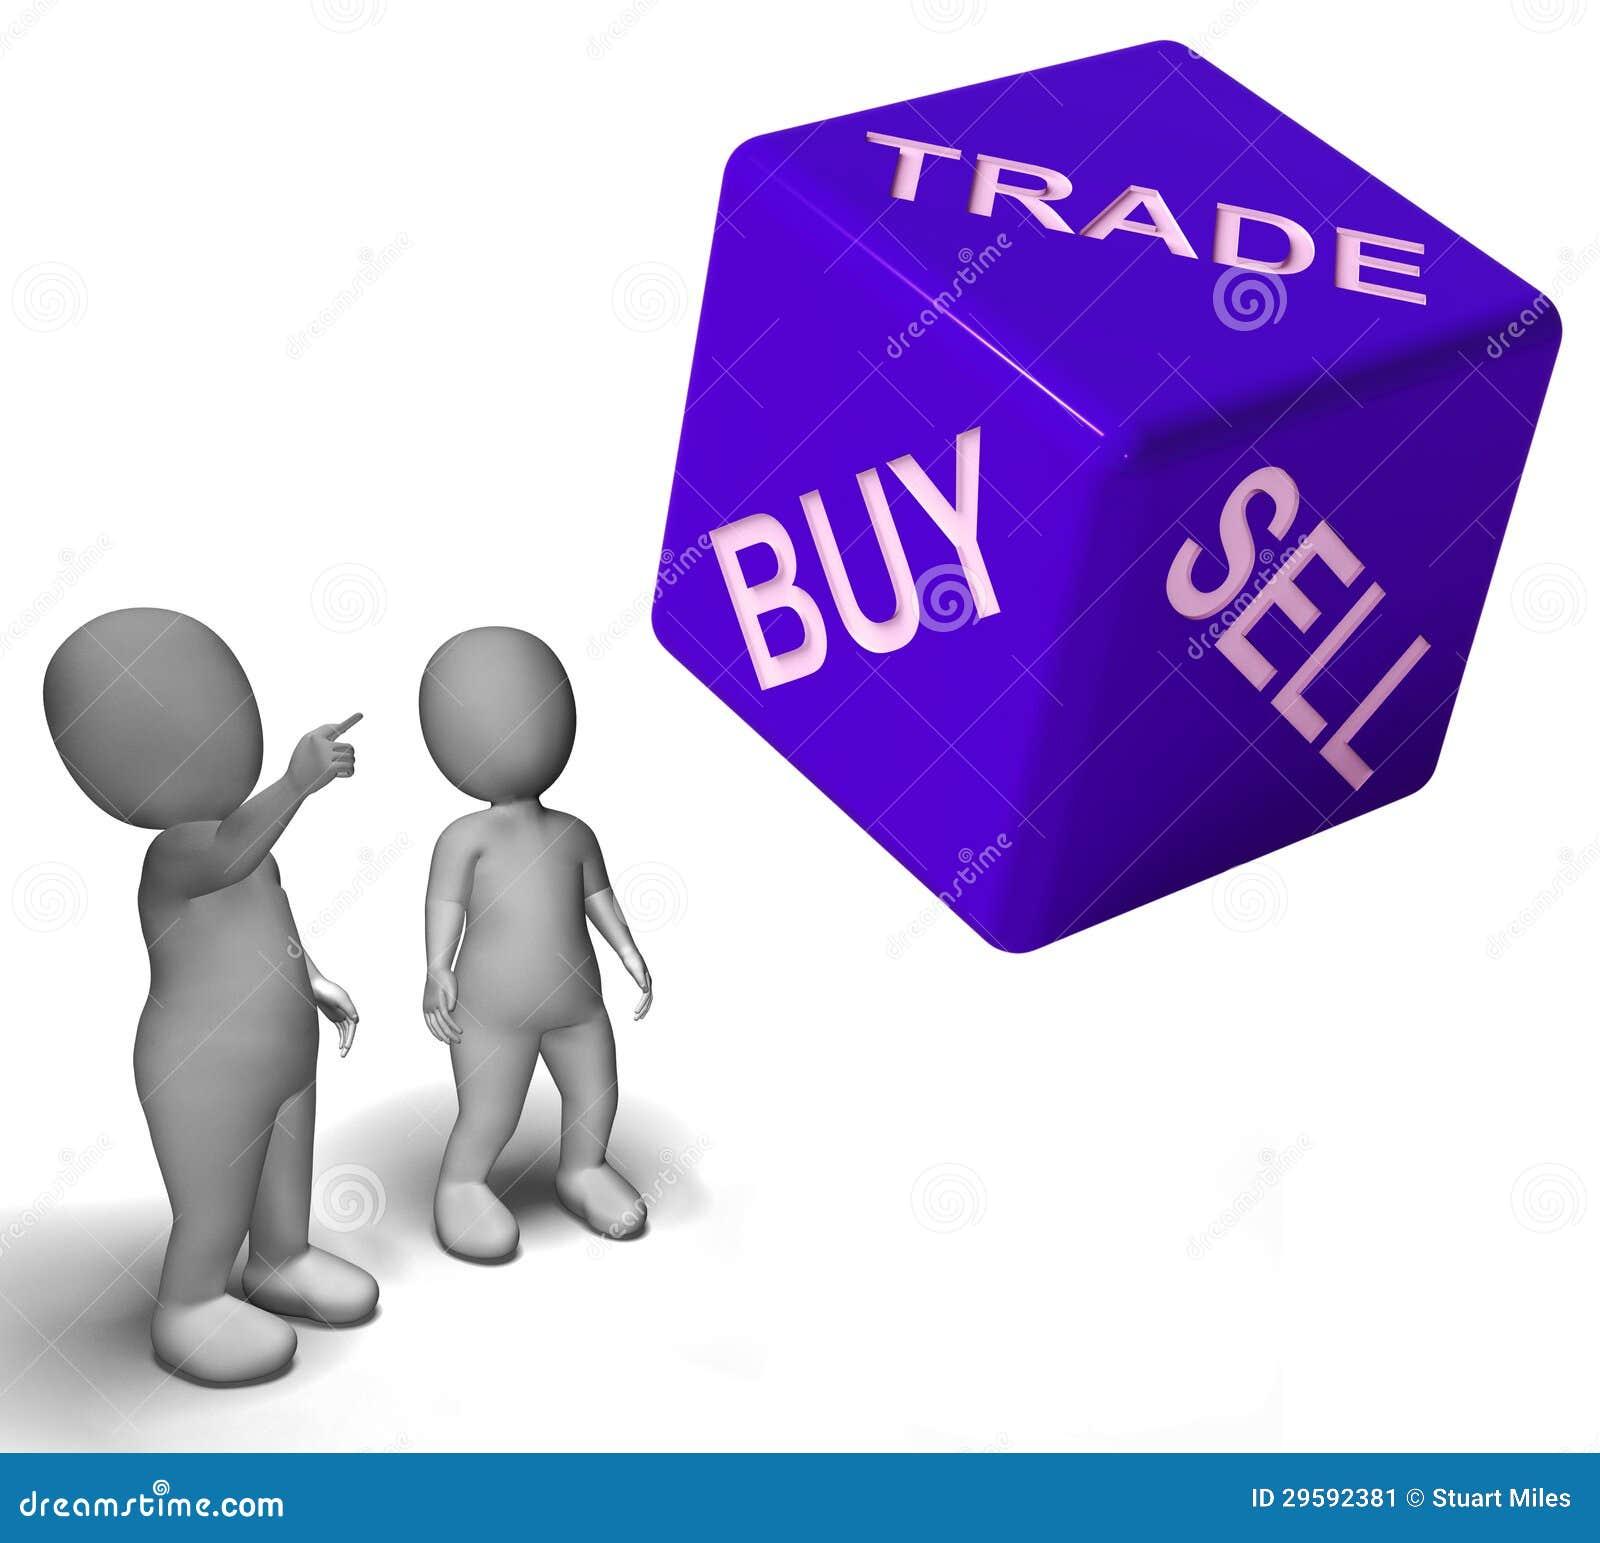 Voordelen Auto Trader